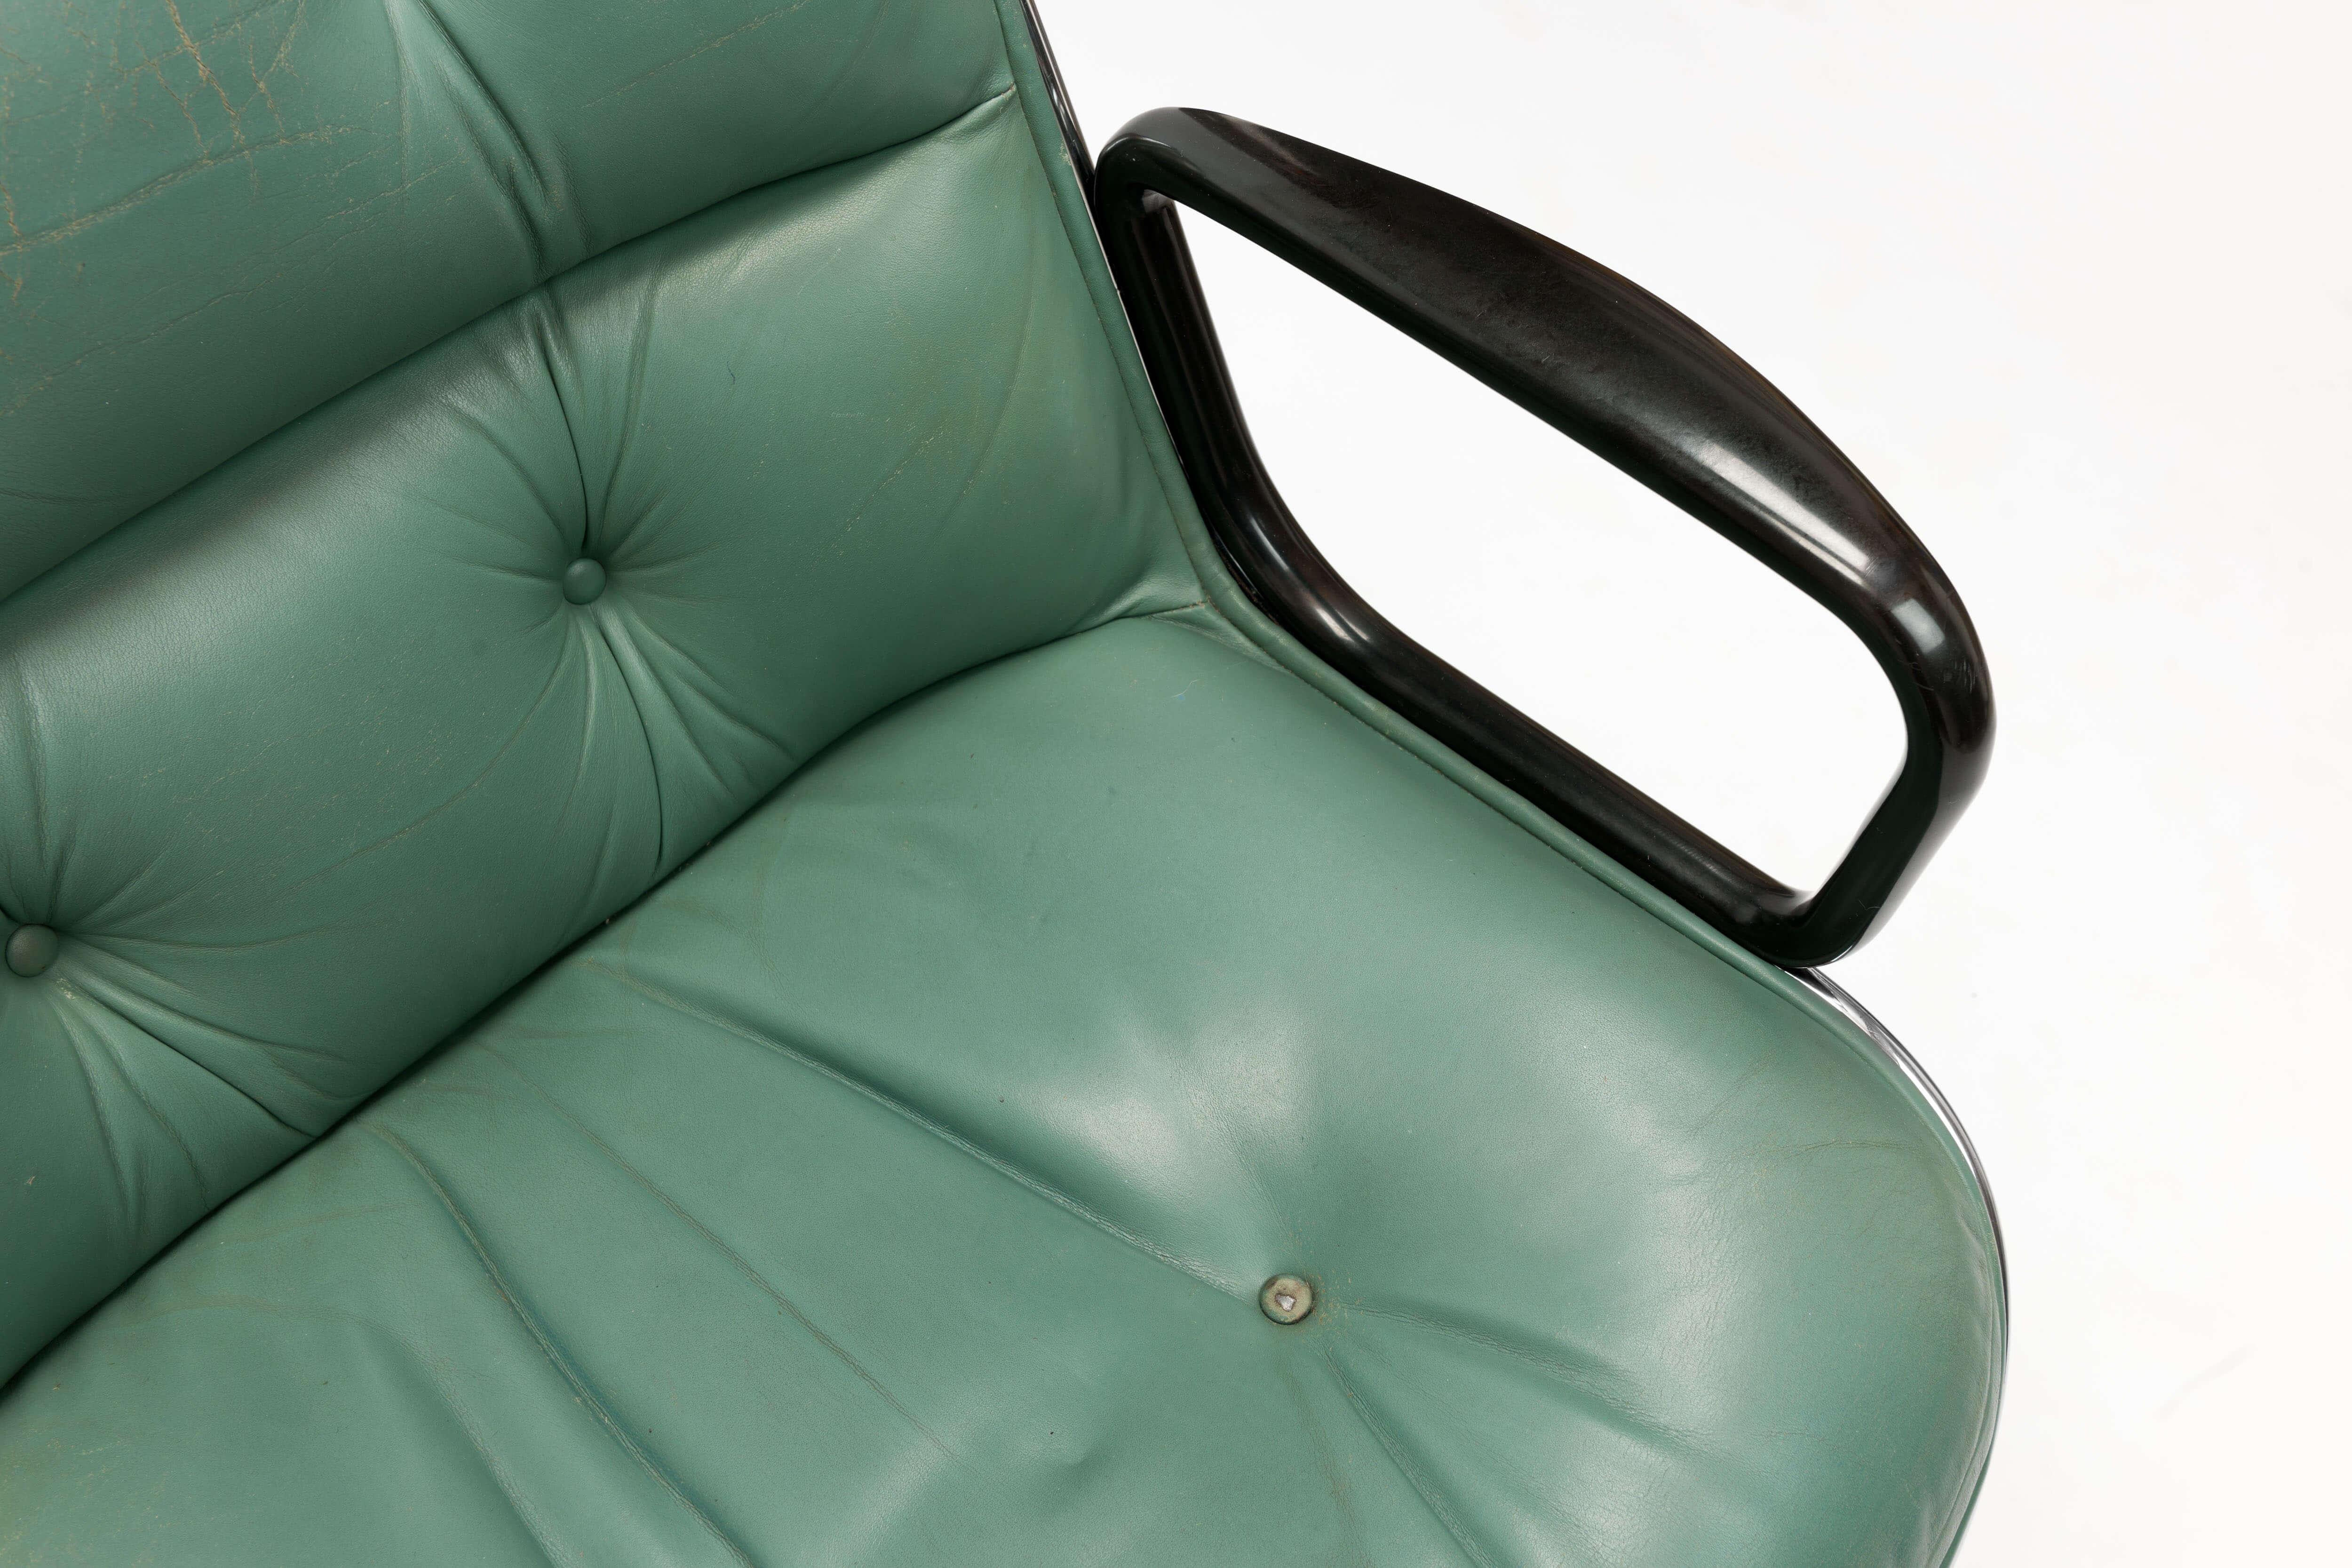 Vintage zeegroene bureaustoel